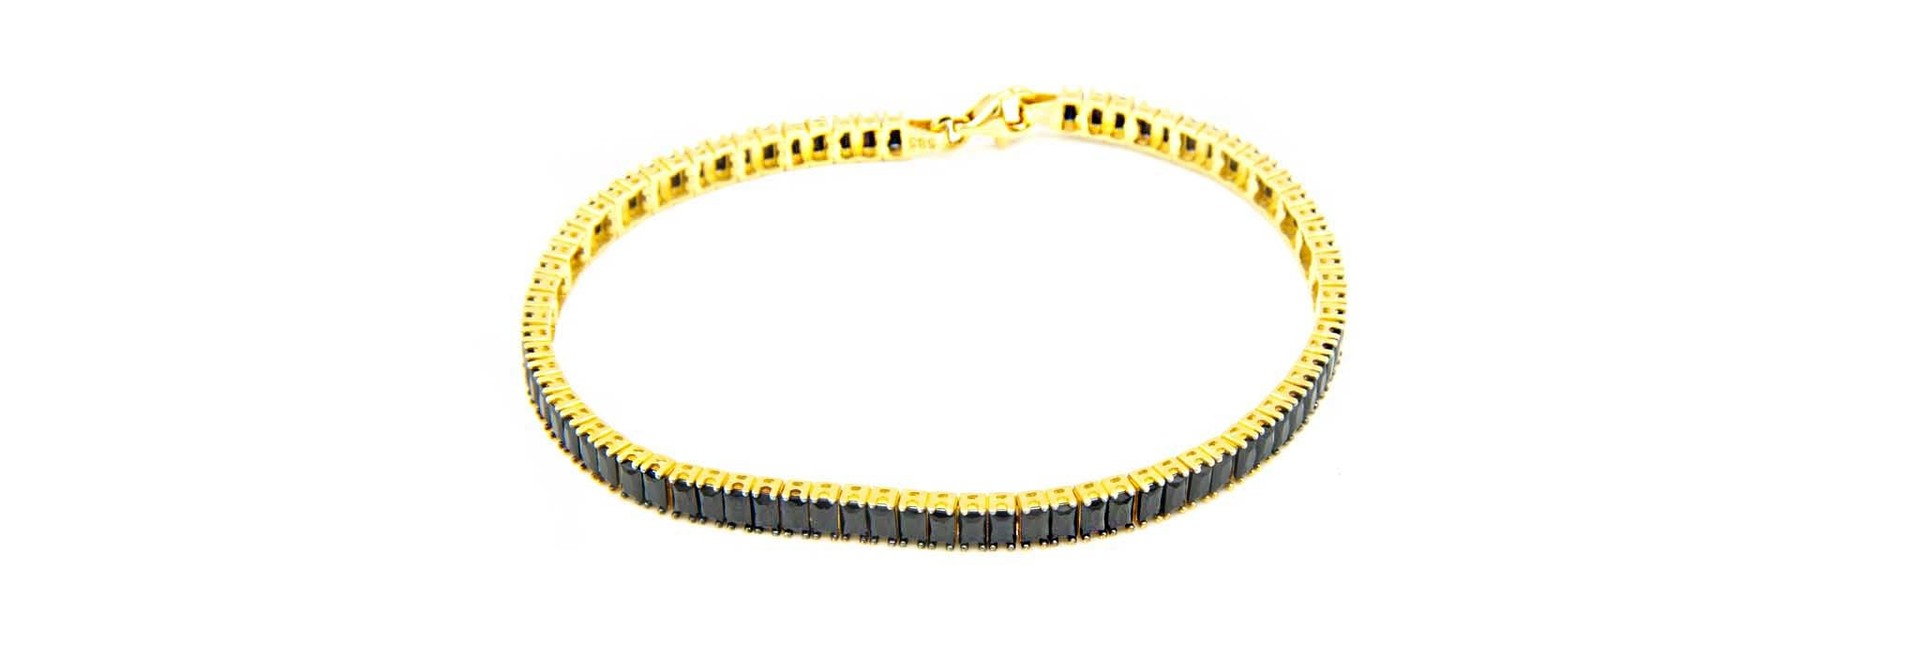 Armband tennisband met zwarte zirkonia's